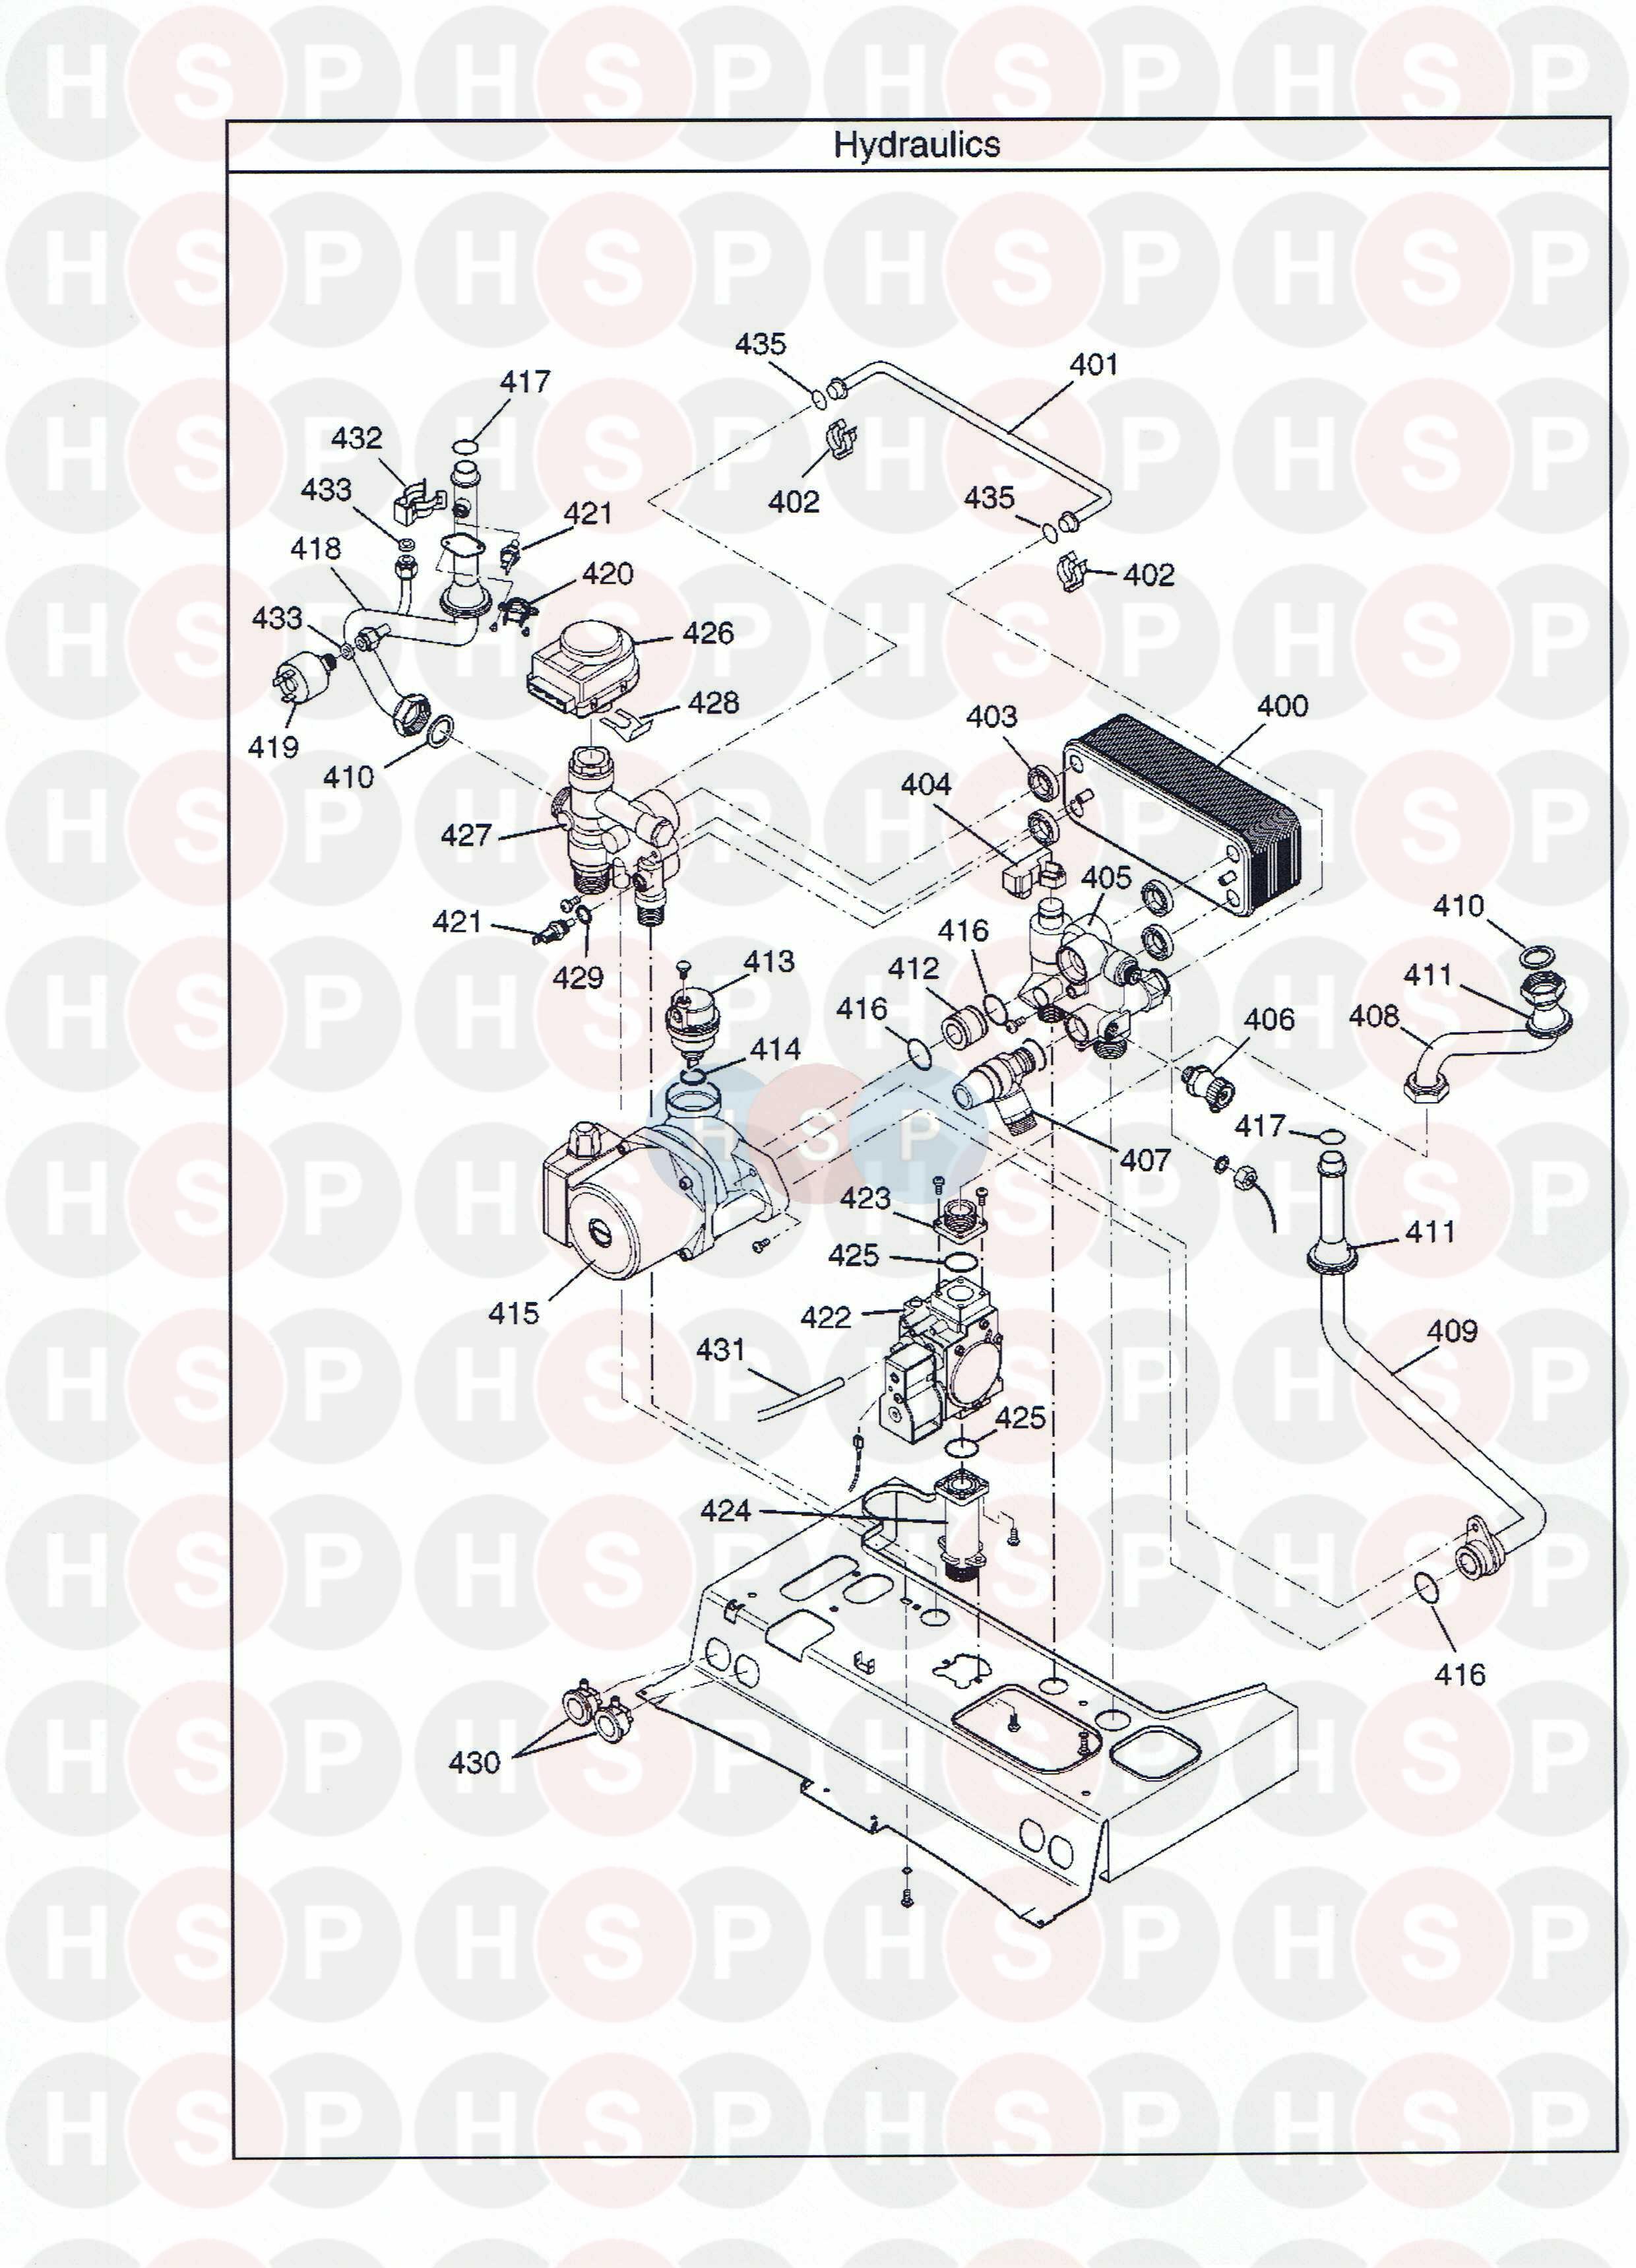 potterton promax combi 28 he plus a  hydraulics  diagram